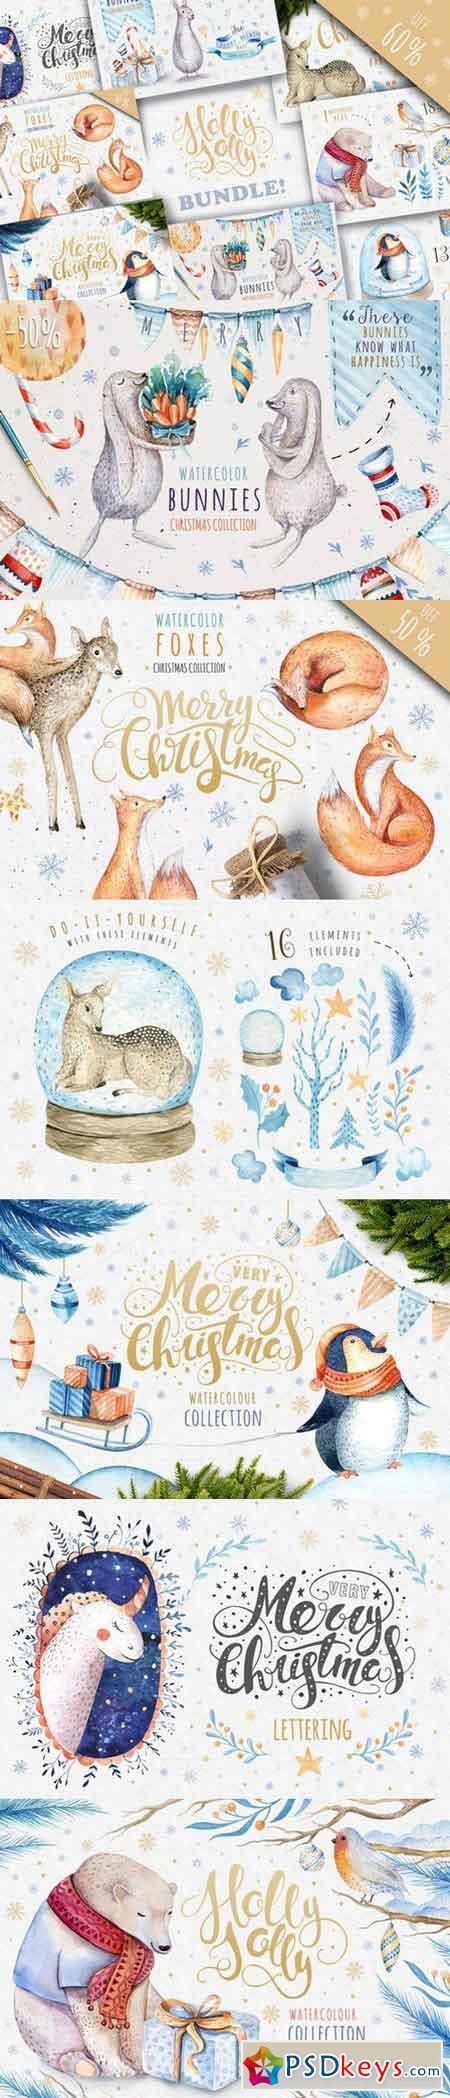 Watercolour Christmas BUNDLE! 991111